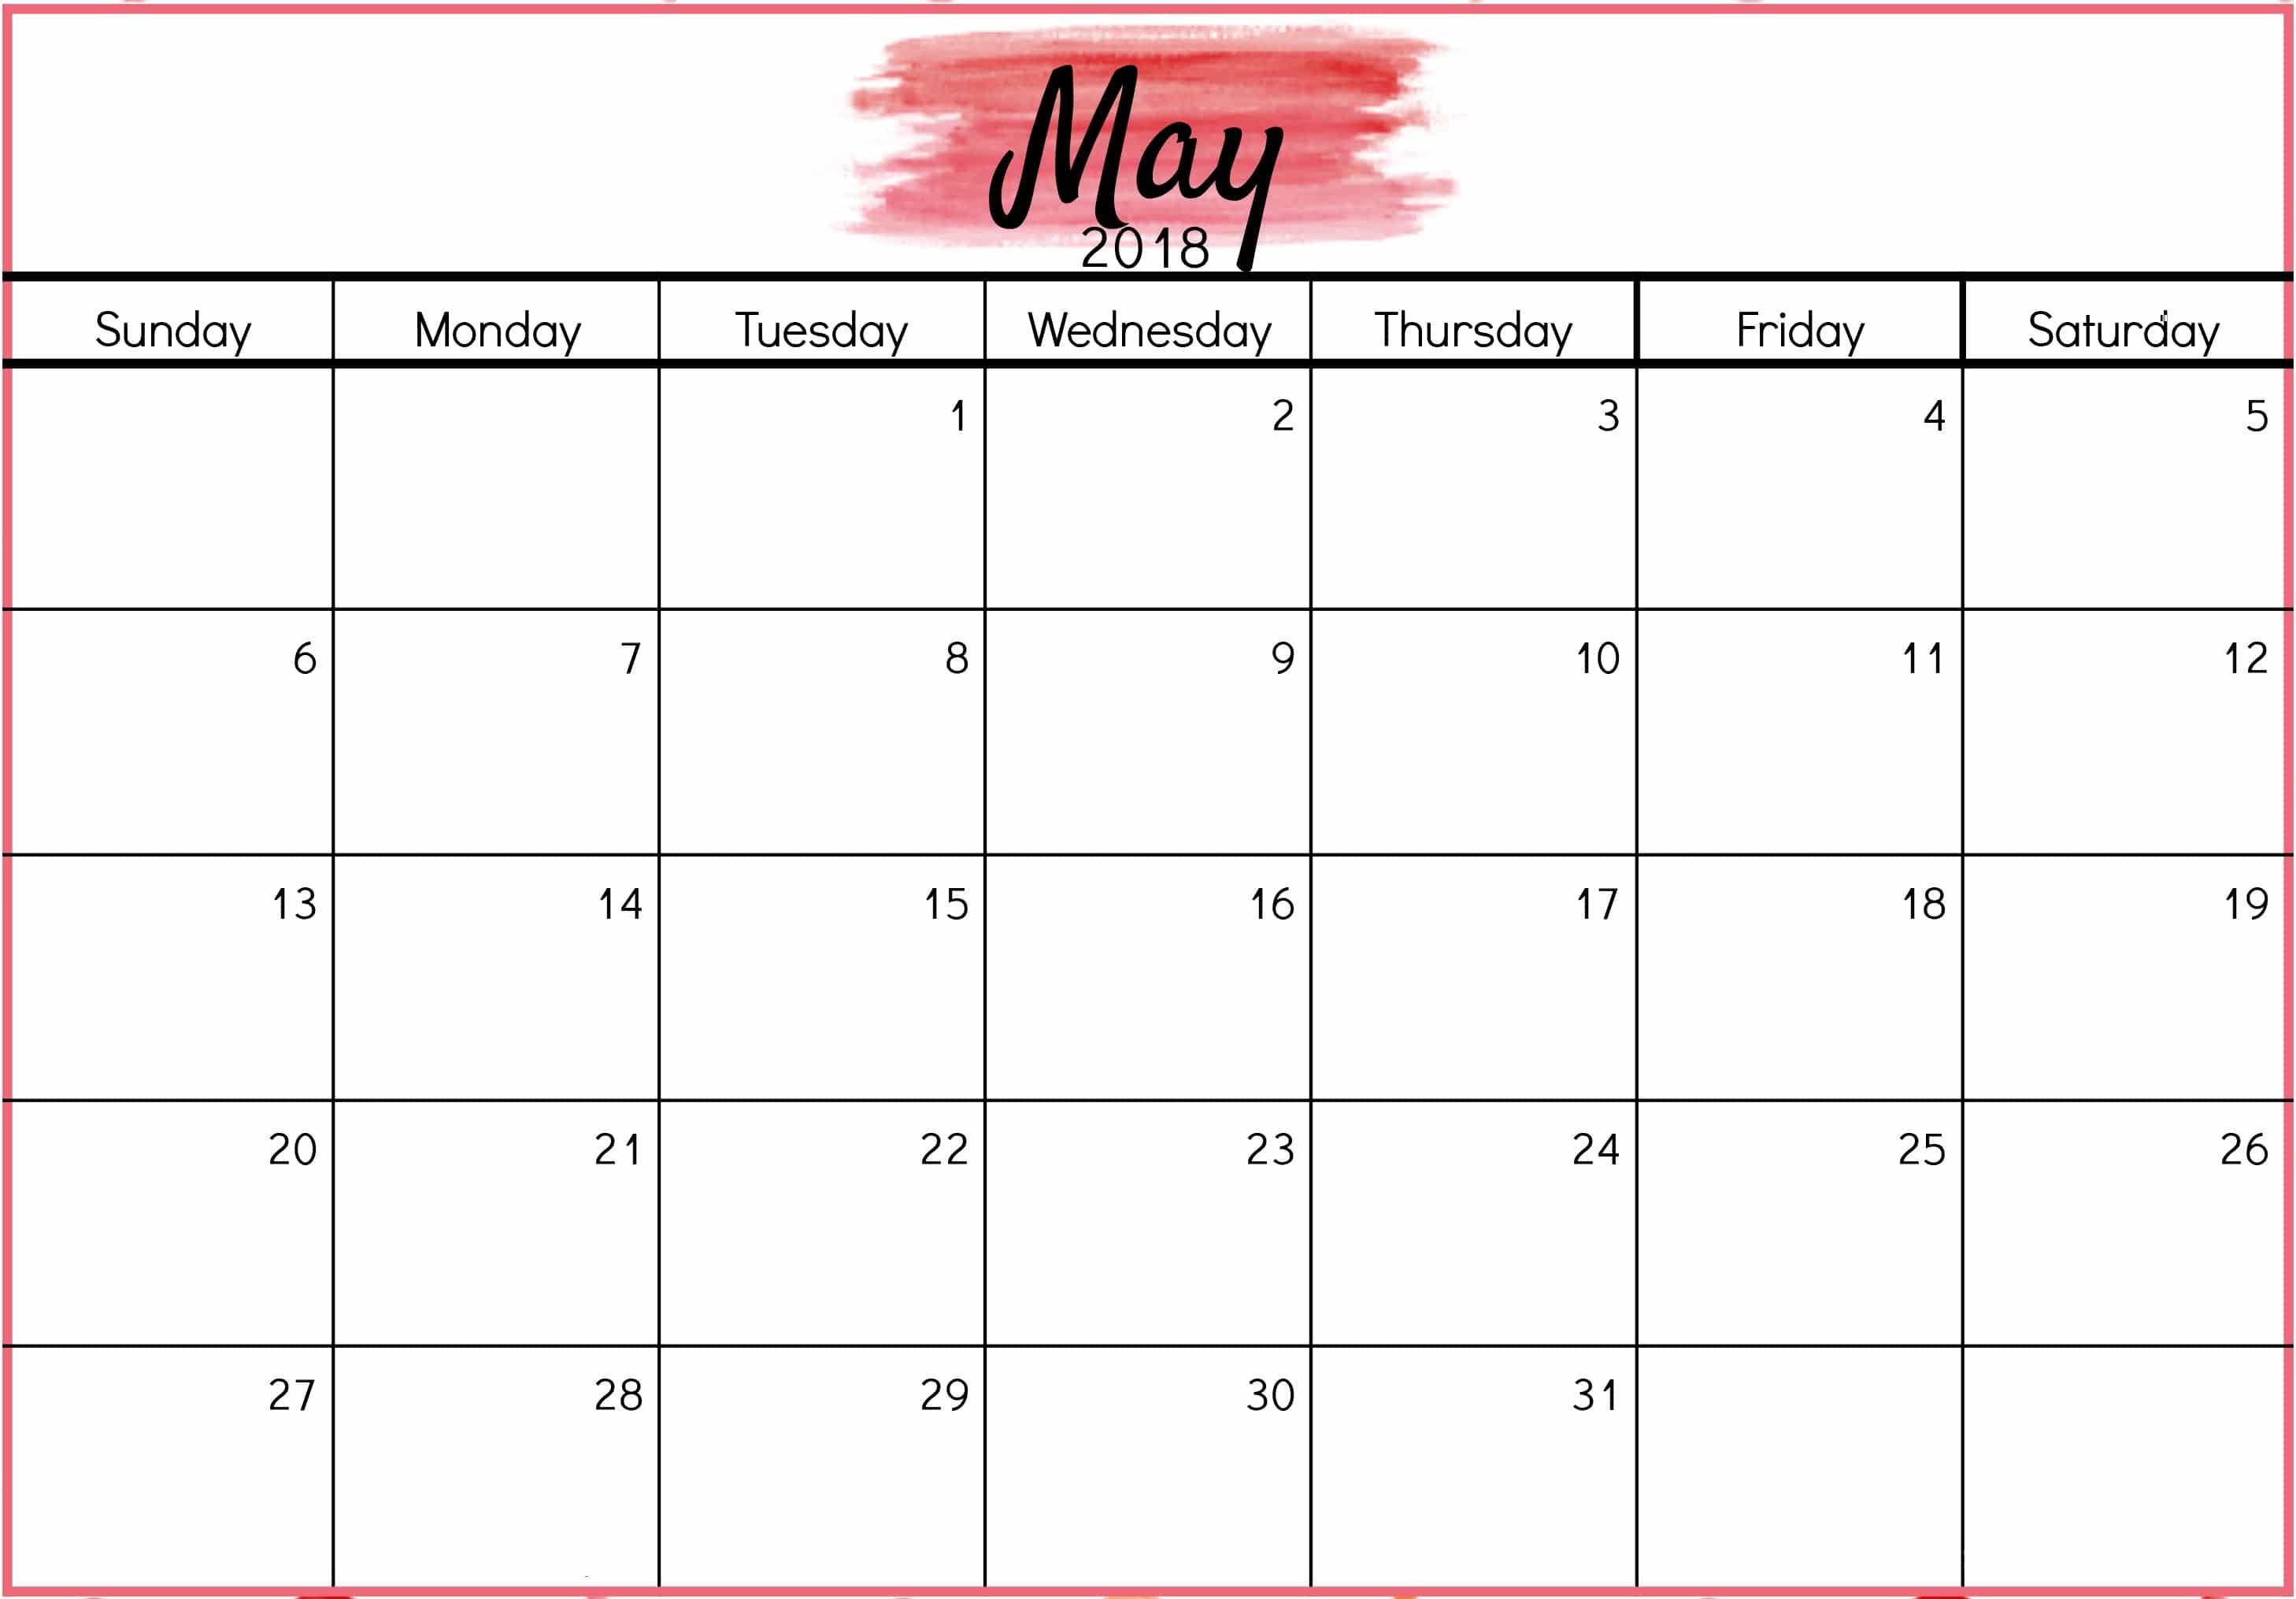 2018 May Calendar Design